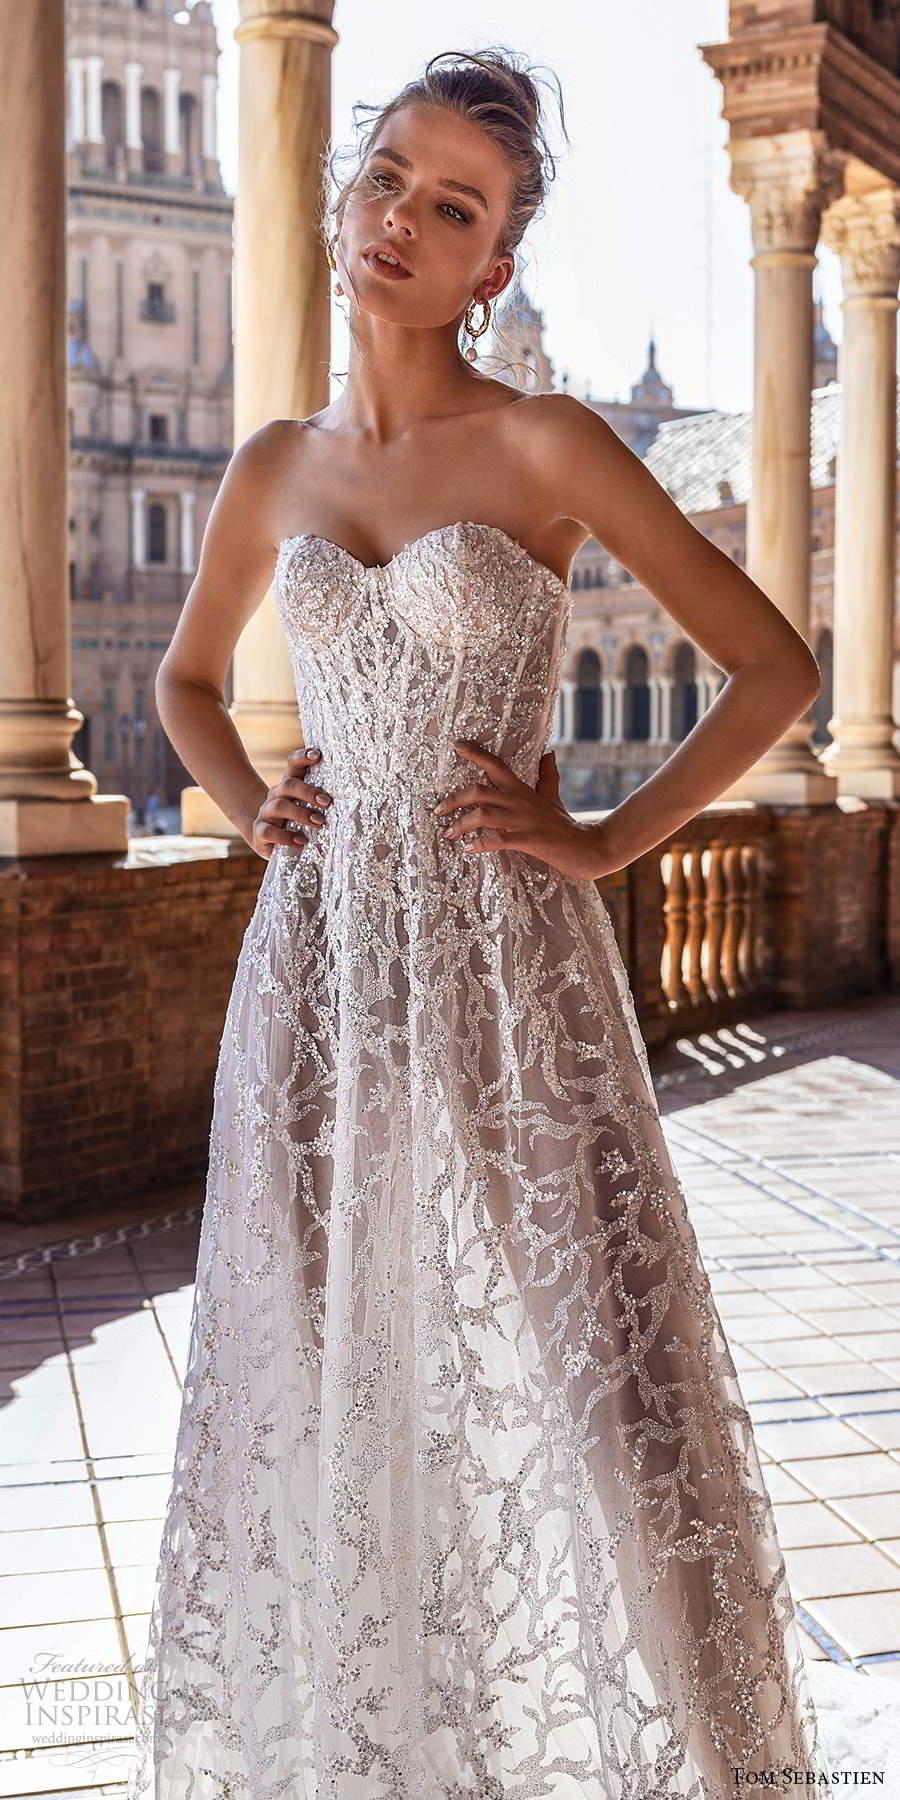 tom sebastien 2021 bridal strapless sweetheart neckline fully embellished a line ball gown wedding dress chapel train (2) zv